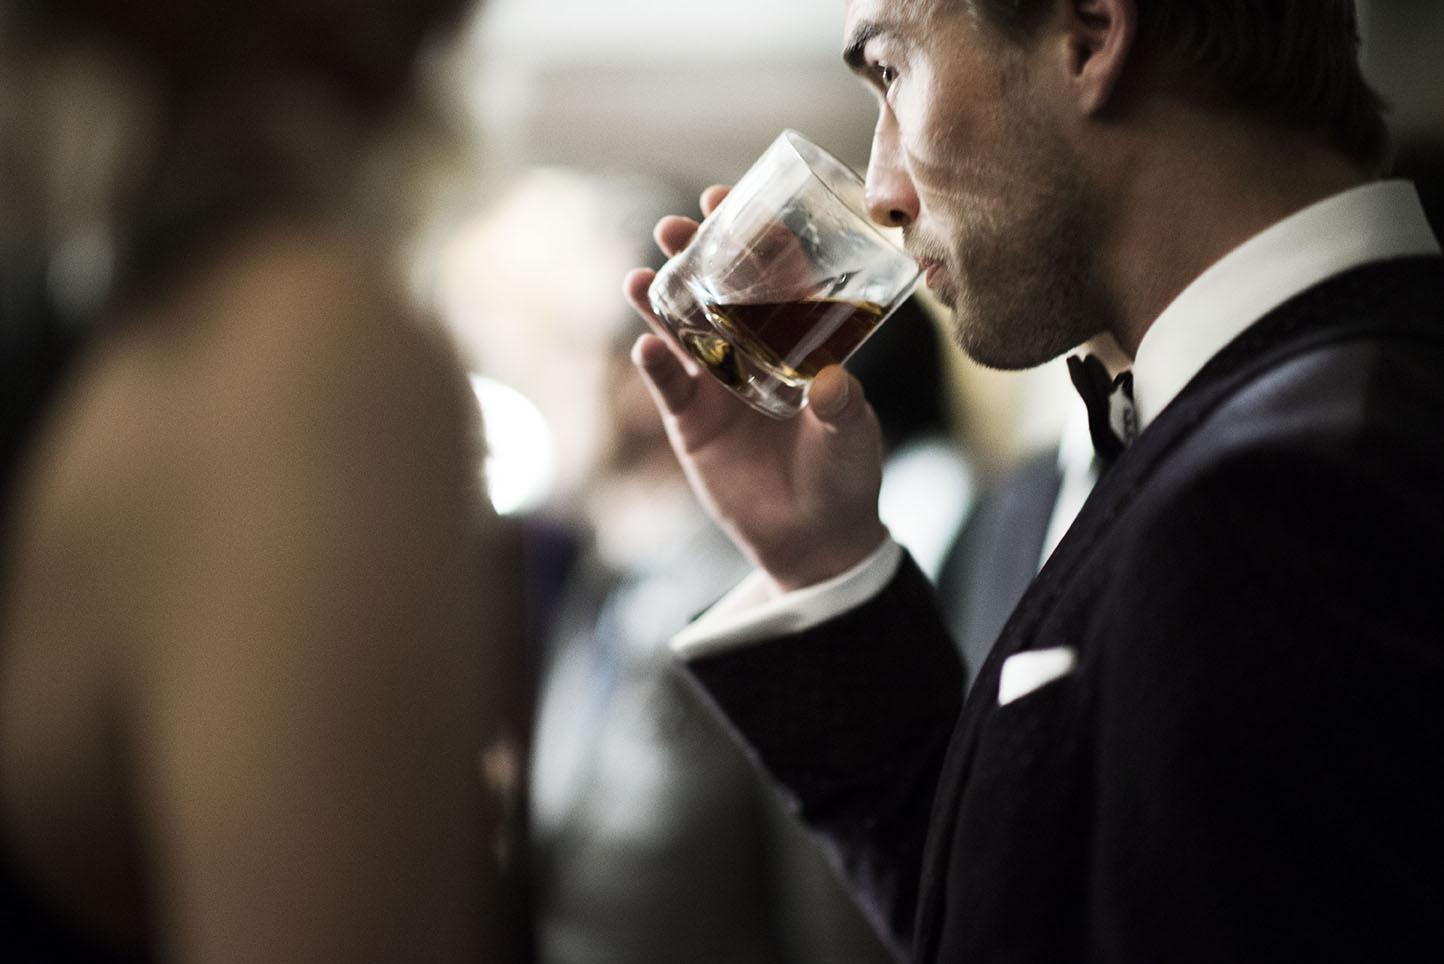 Vinul rosu si erectia - vreo legatura? - Doctor MIT